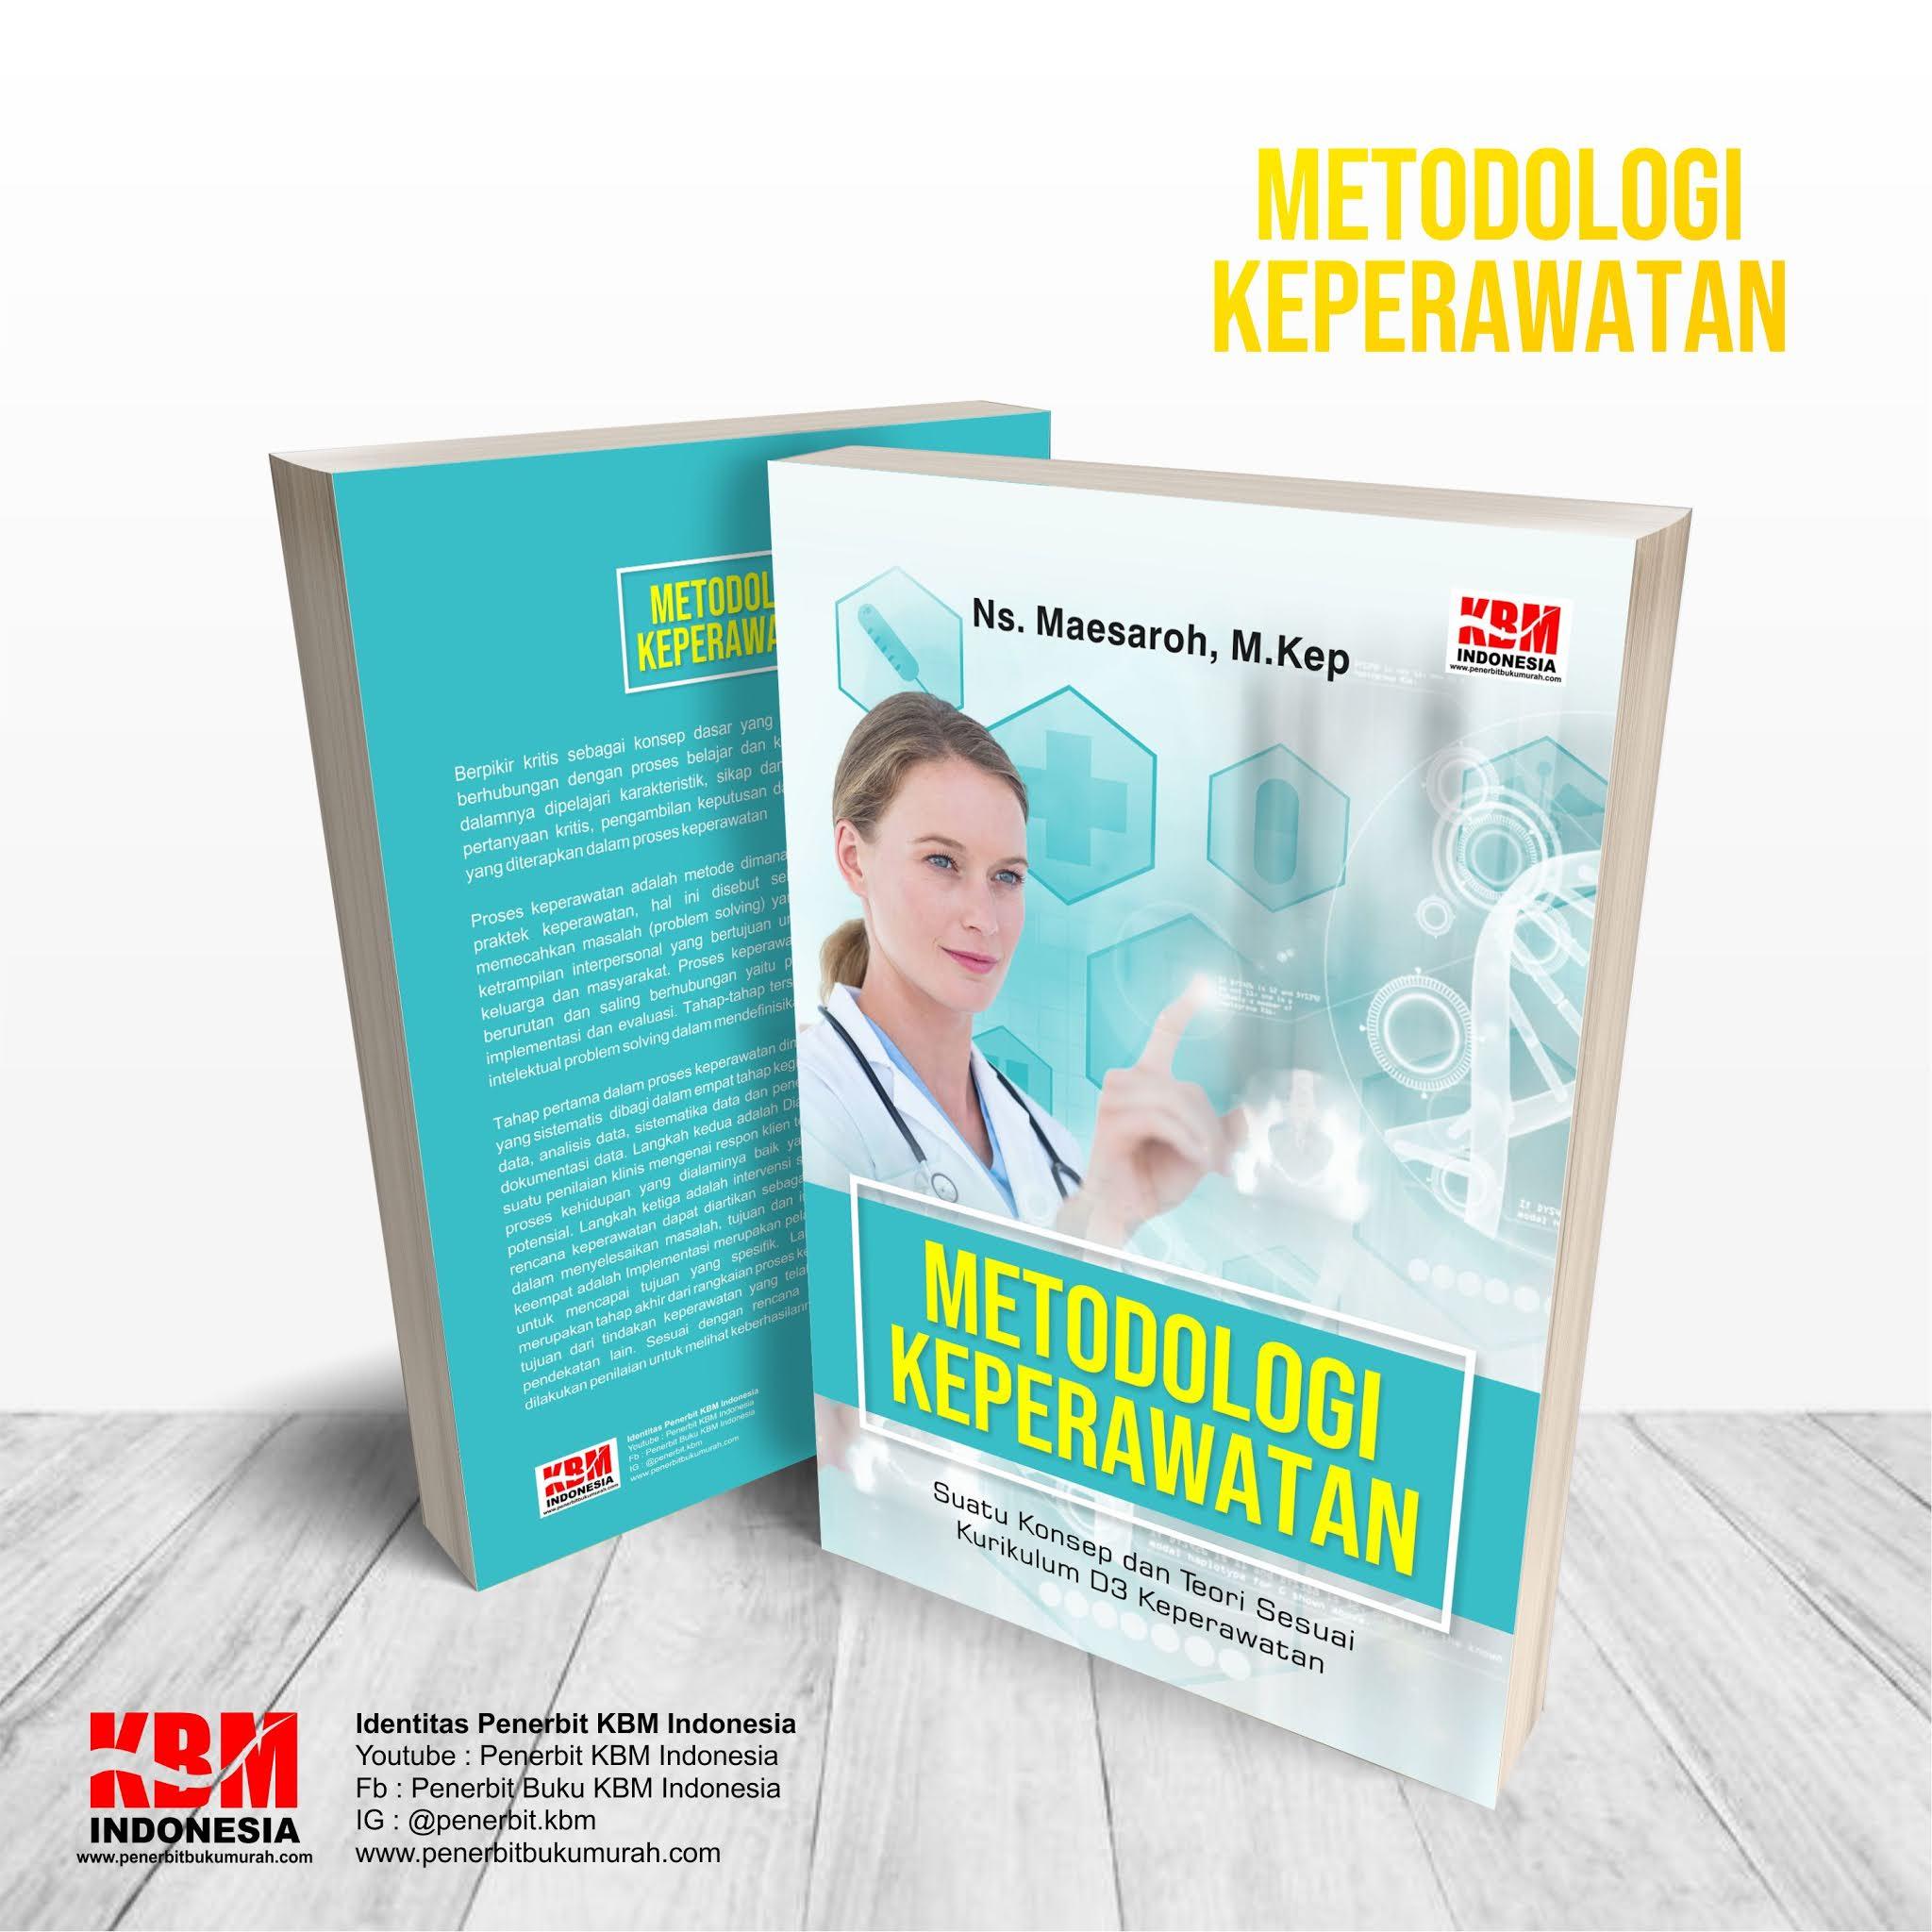 METODOLOGI KEPERAWATAN (Suatu Konsep & Teori Sesuai Kurikulum  D3 Keperawatan)